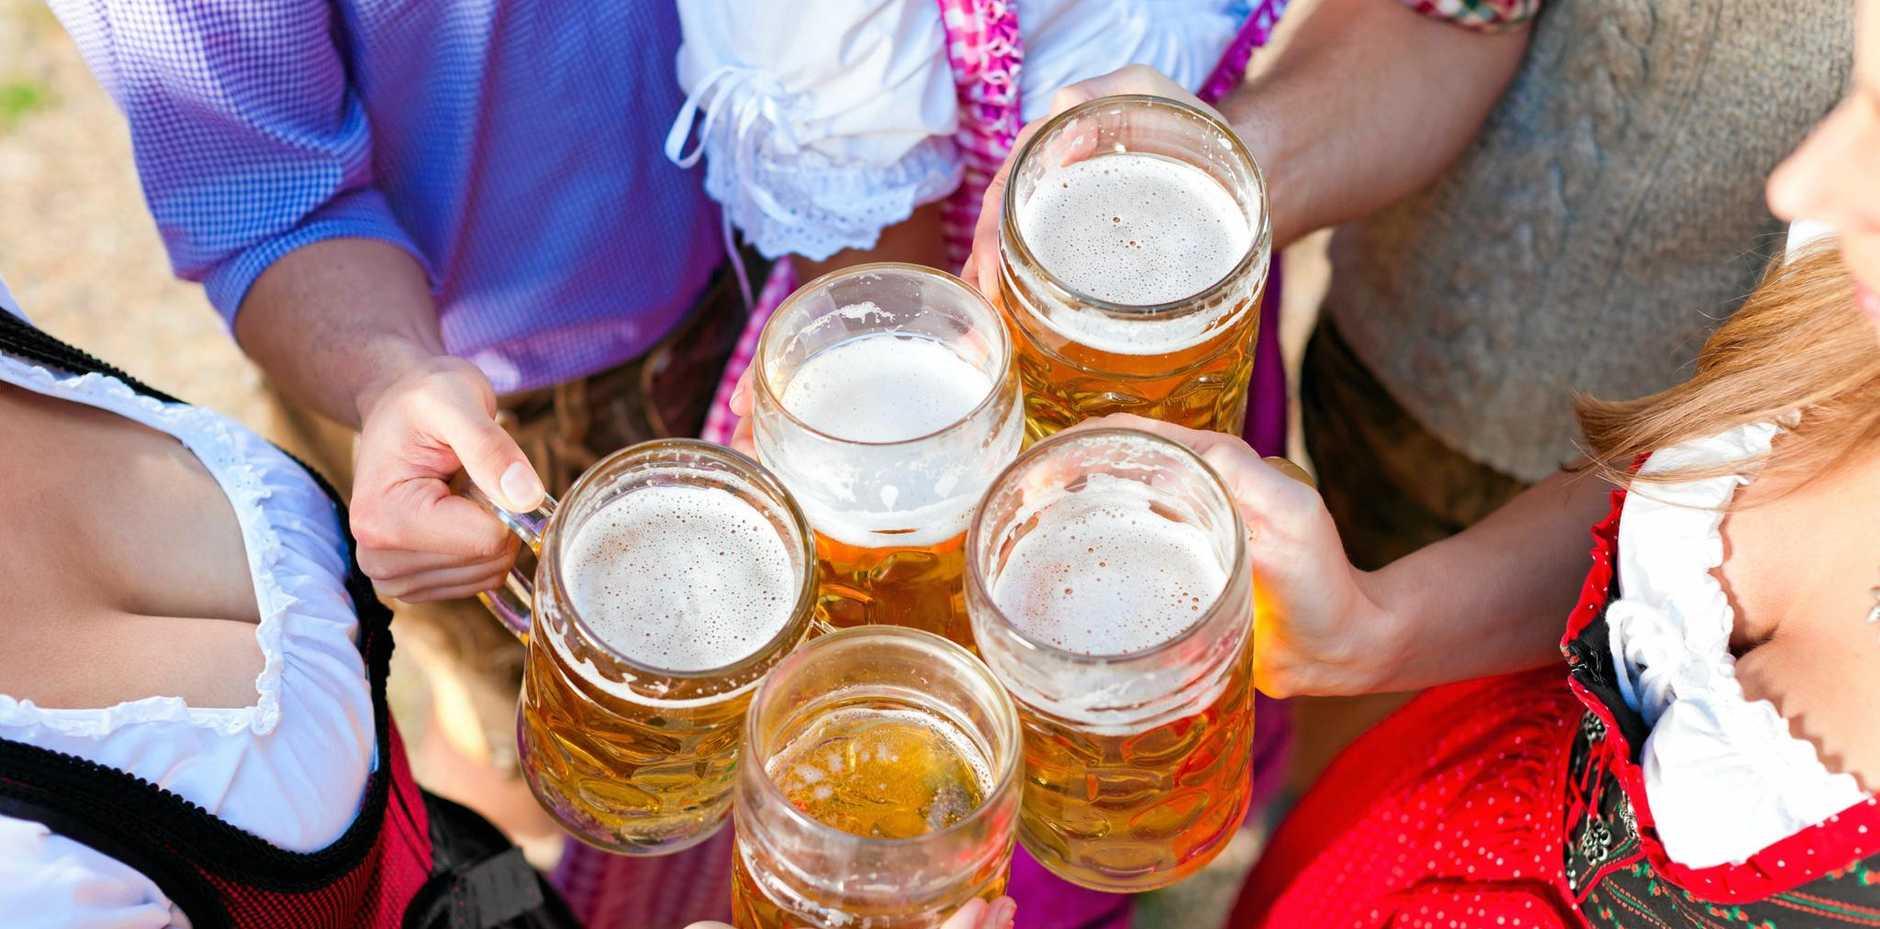 GERMAN FESTIVITIES: Celebrate Oktoberfest at RiverFeast this Sunday.